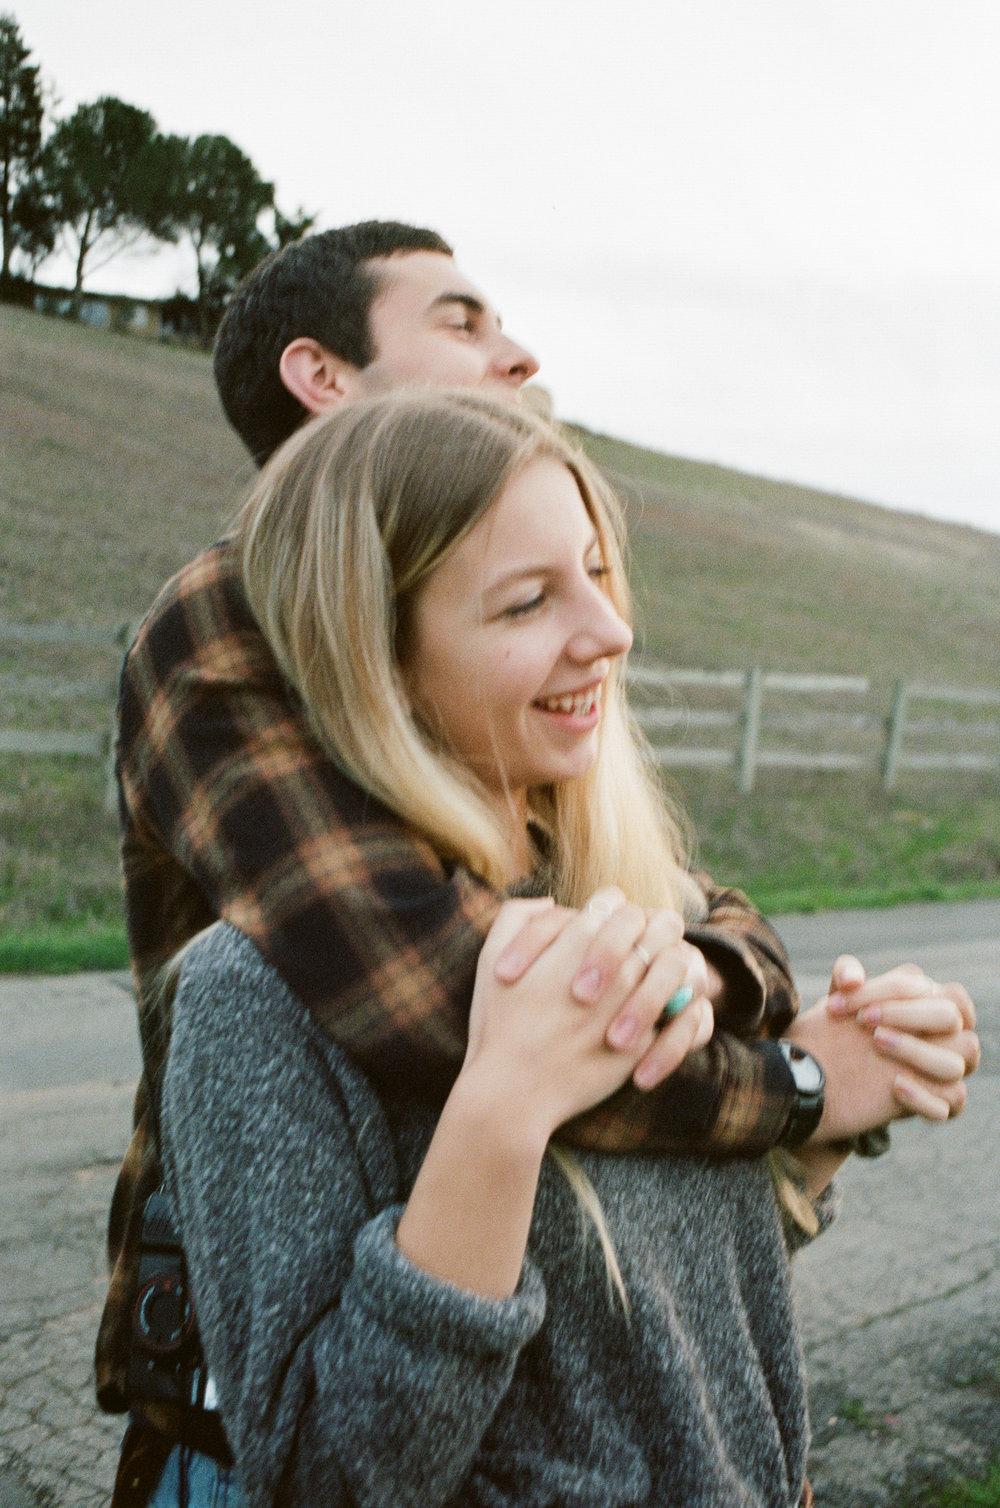 hannah&cole-california-film-jan2019-peytoncurry-000098780024.jpg